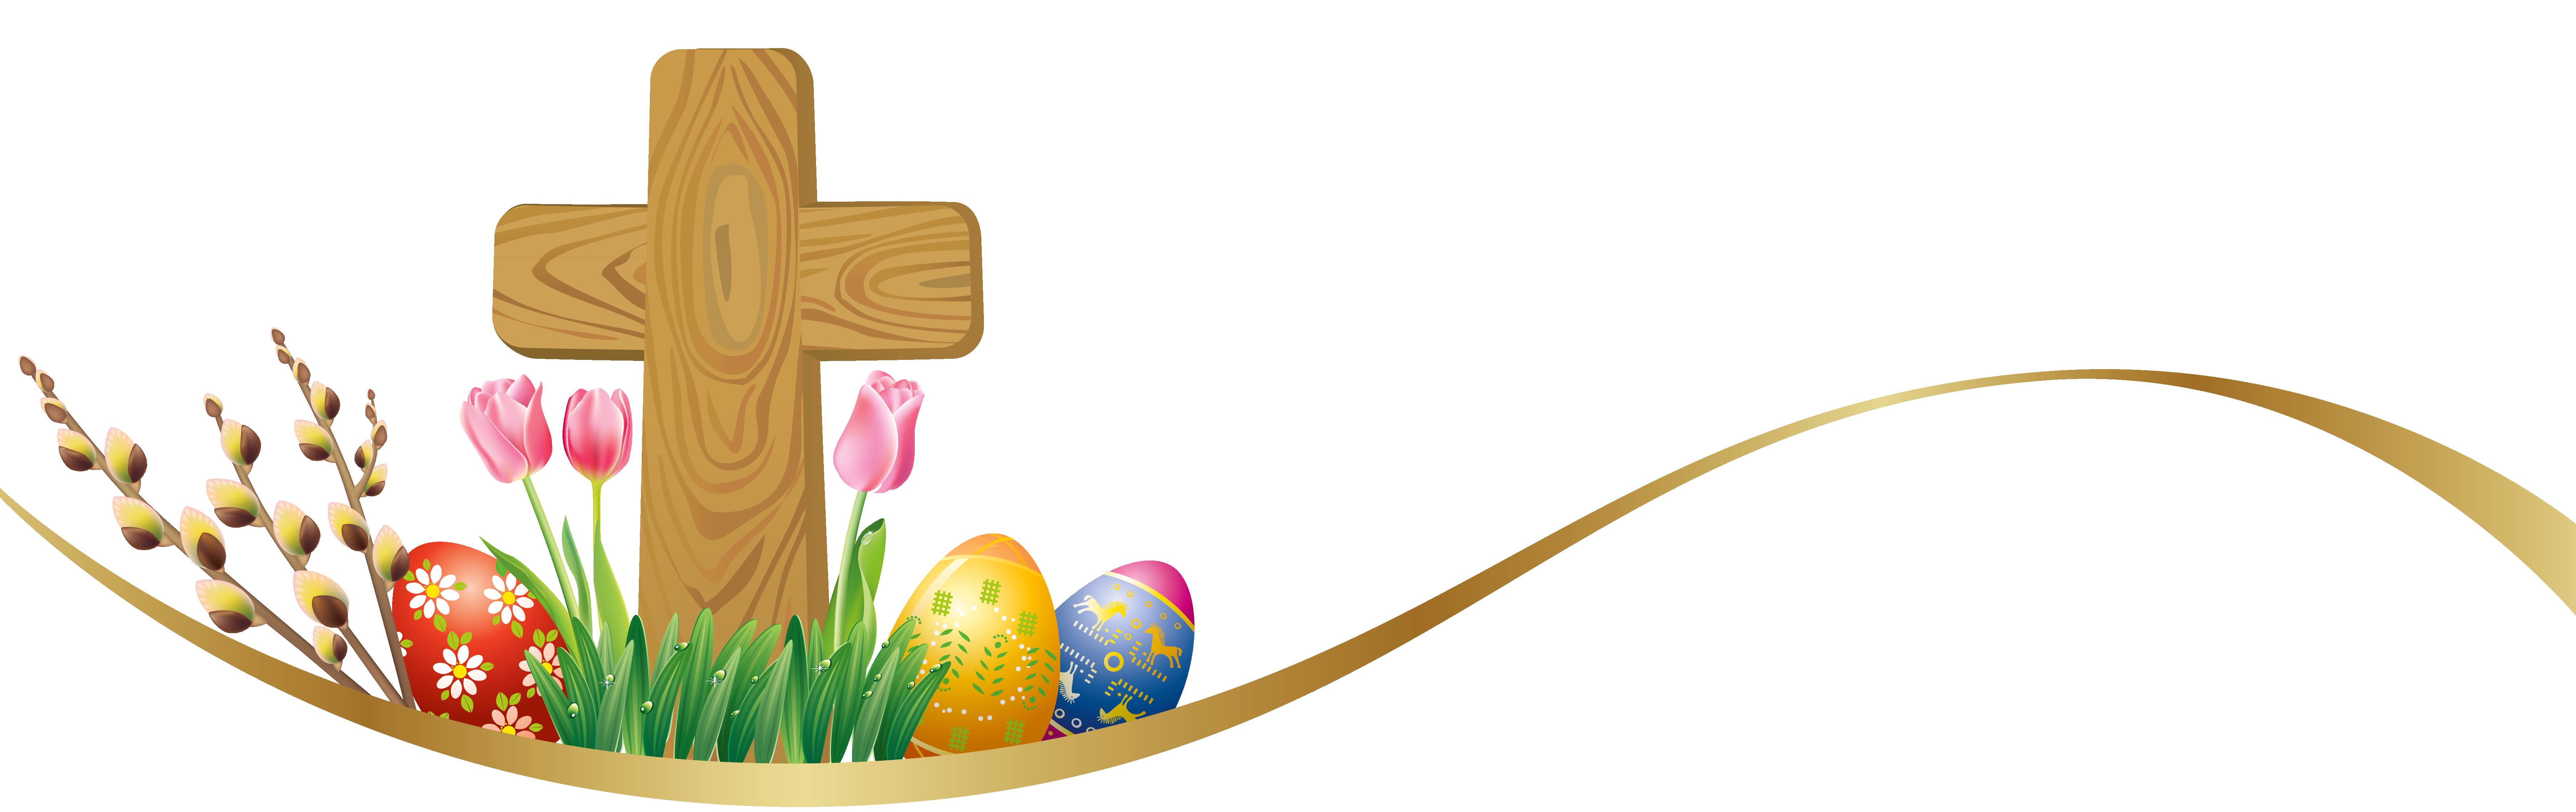 7226x2279 Easter Crosses Clipart